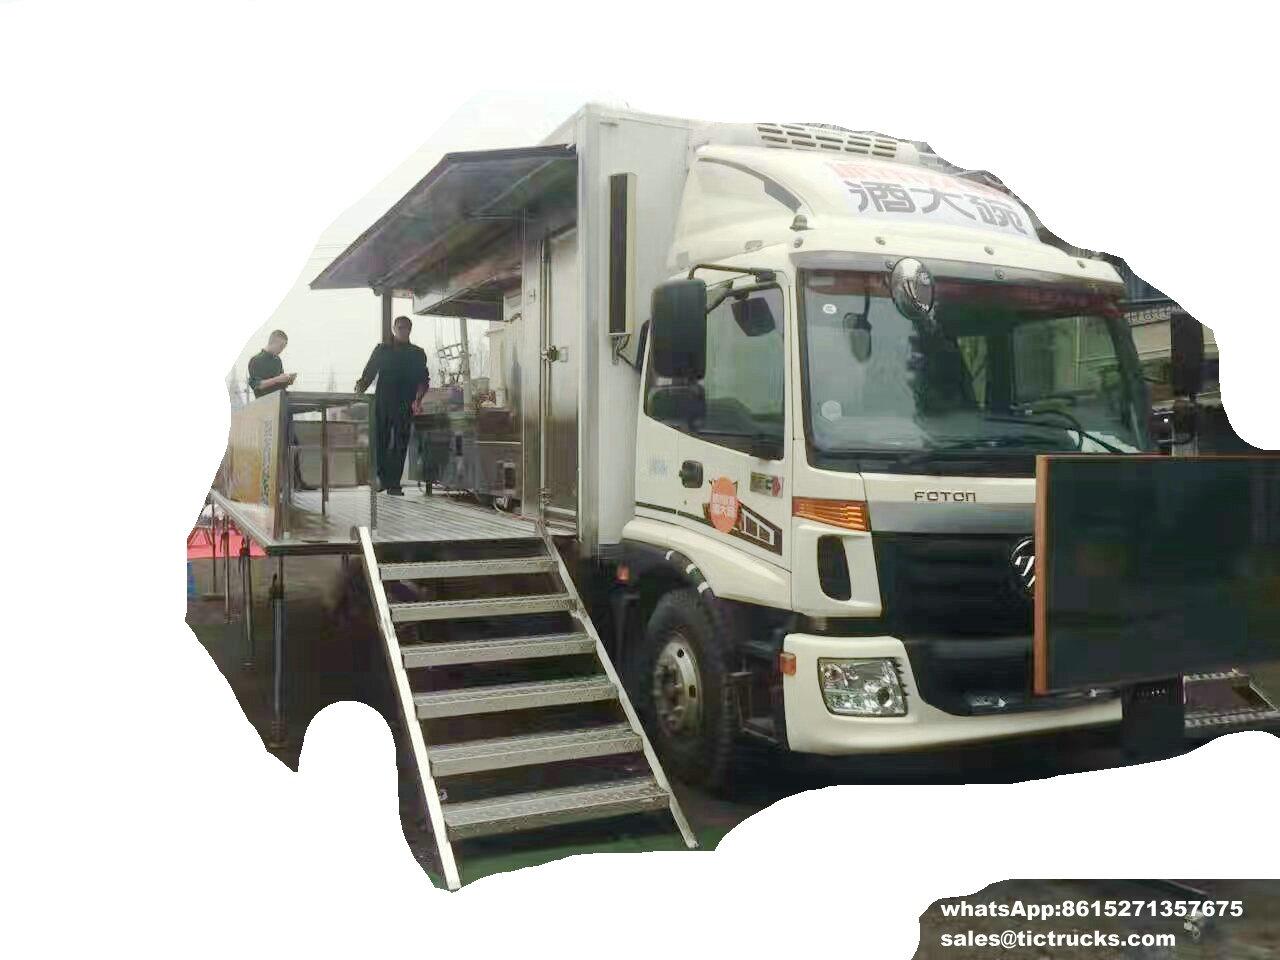 Camion -02-_1.jpg de nourriture de Foton